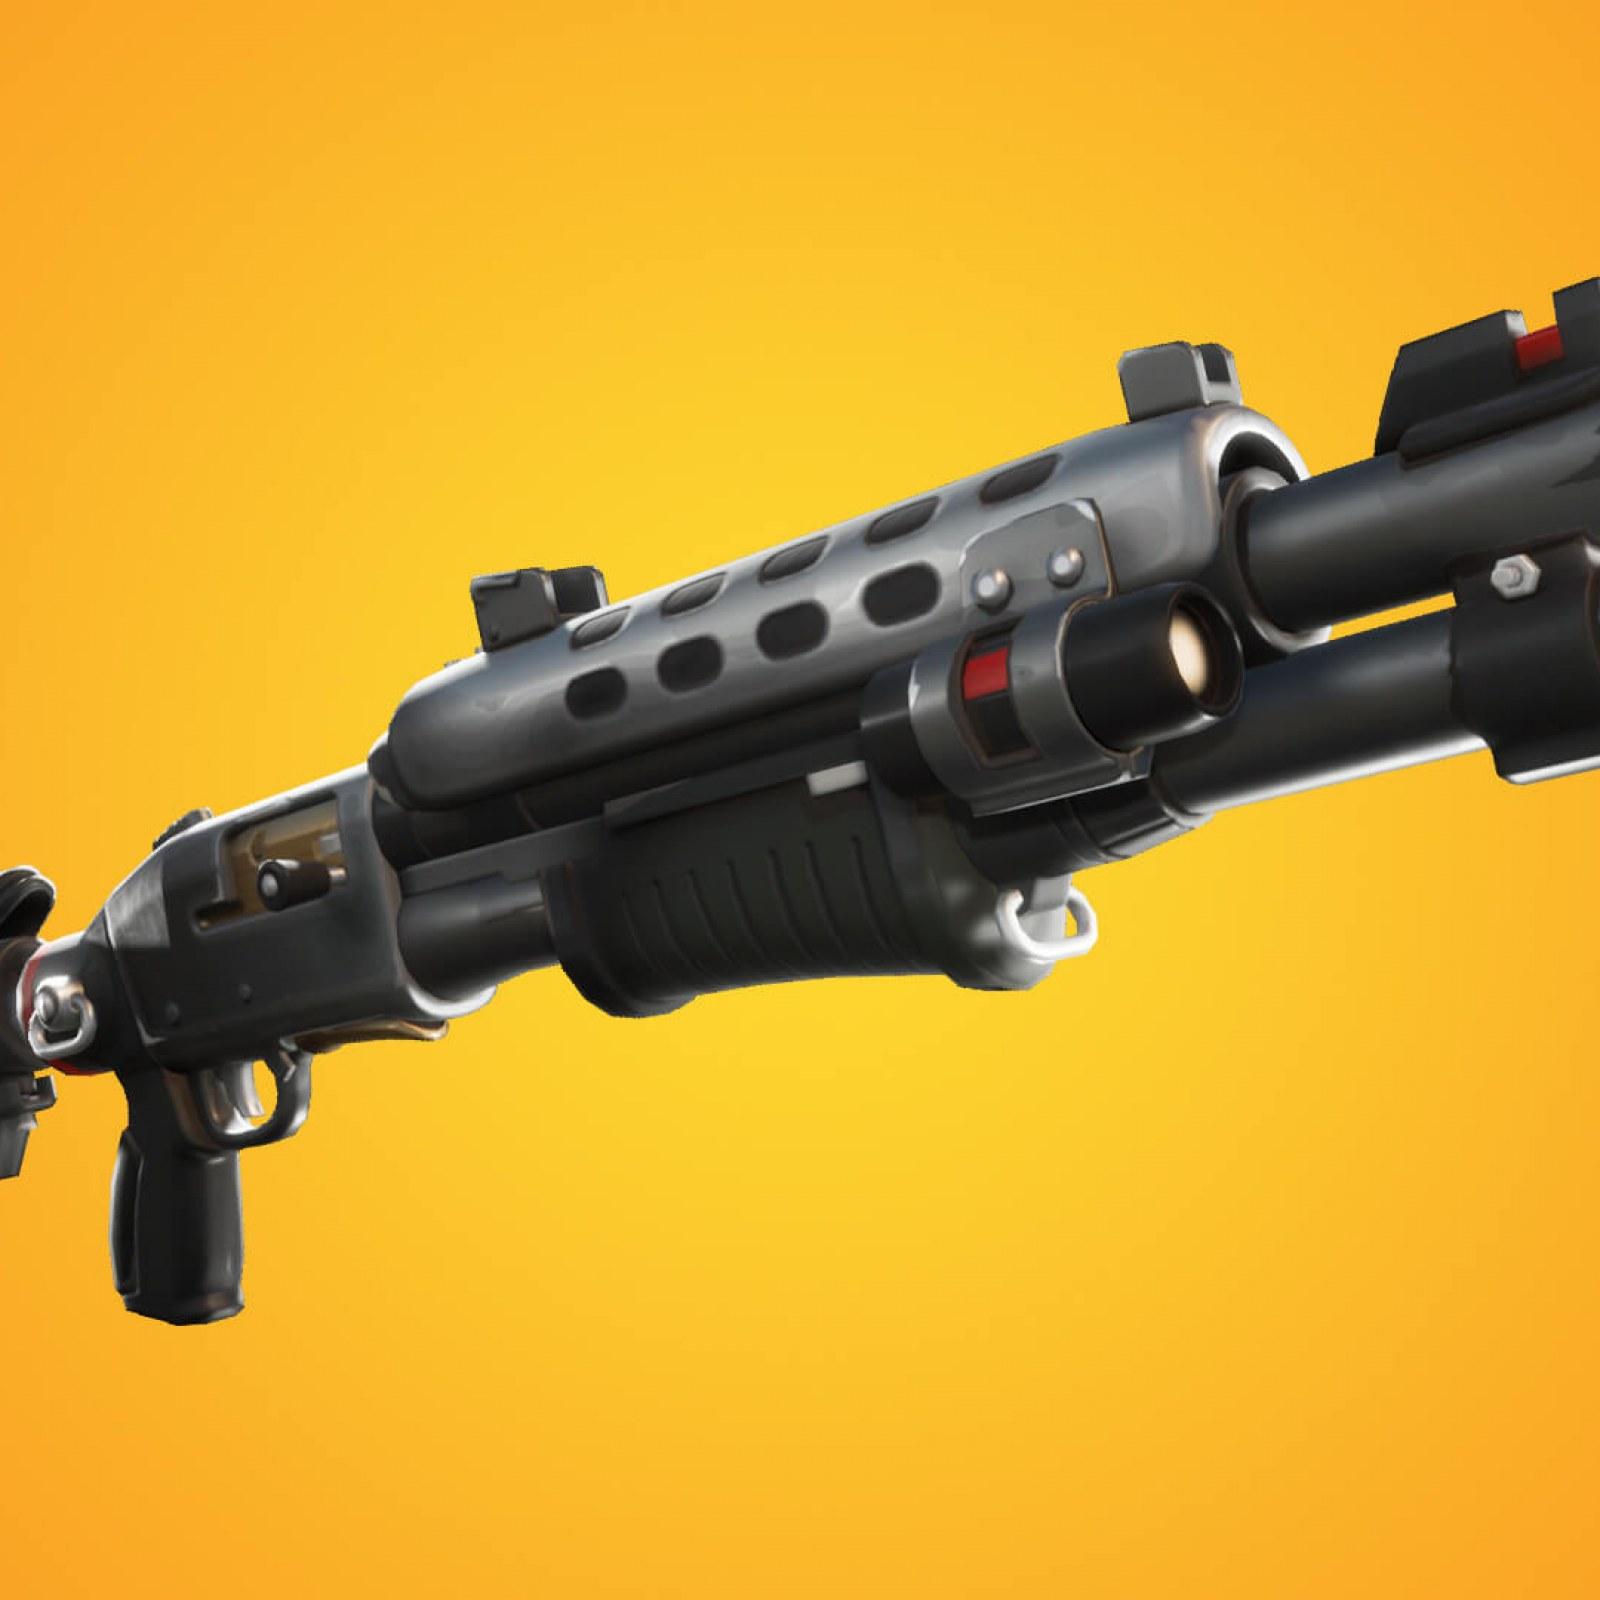 Fortnite' Update 9 40 Adds New Tactical Shotgun, Nerfs